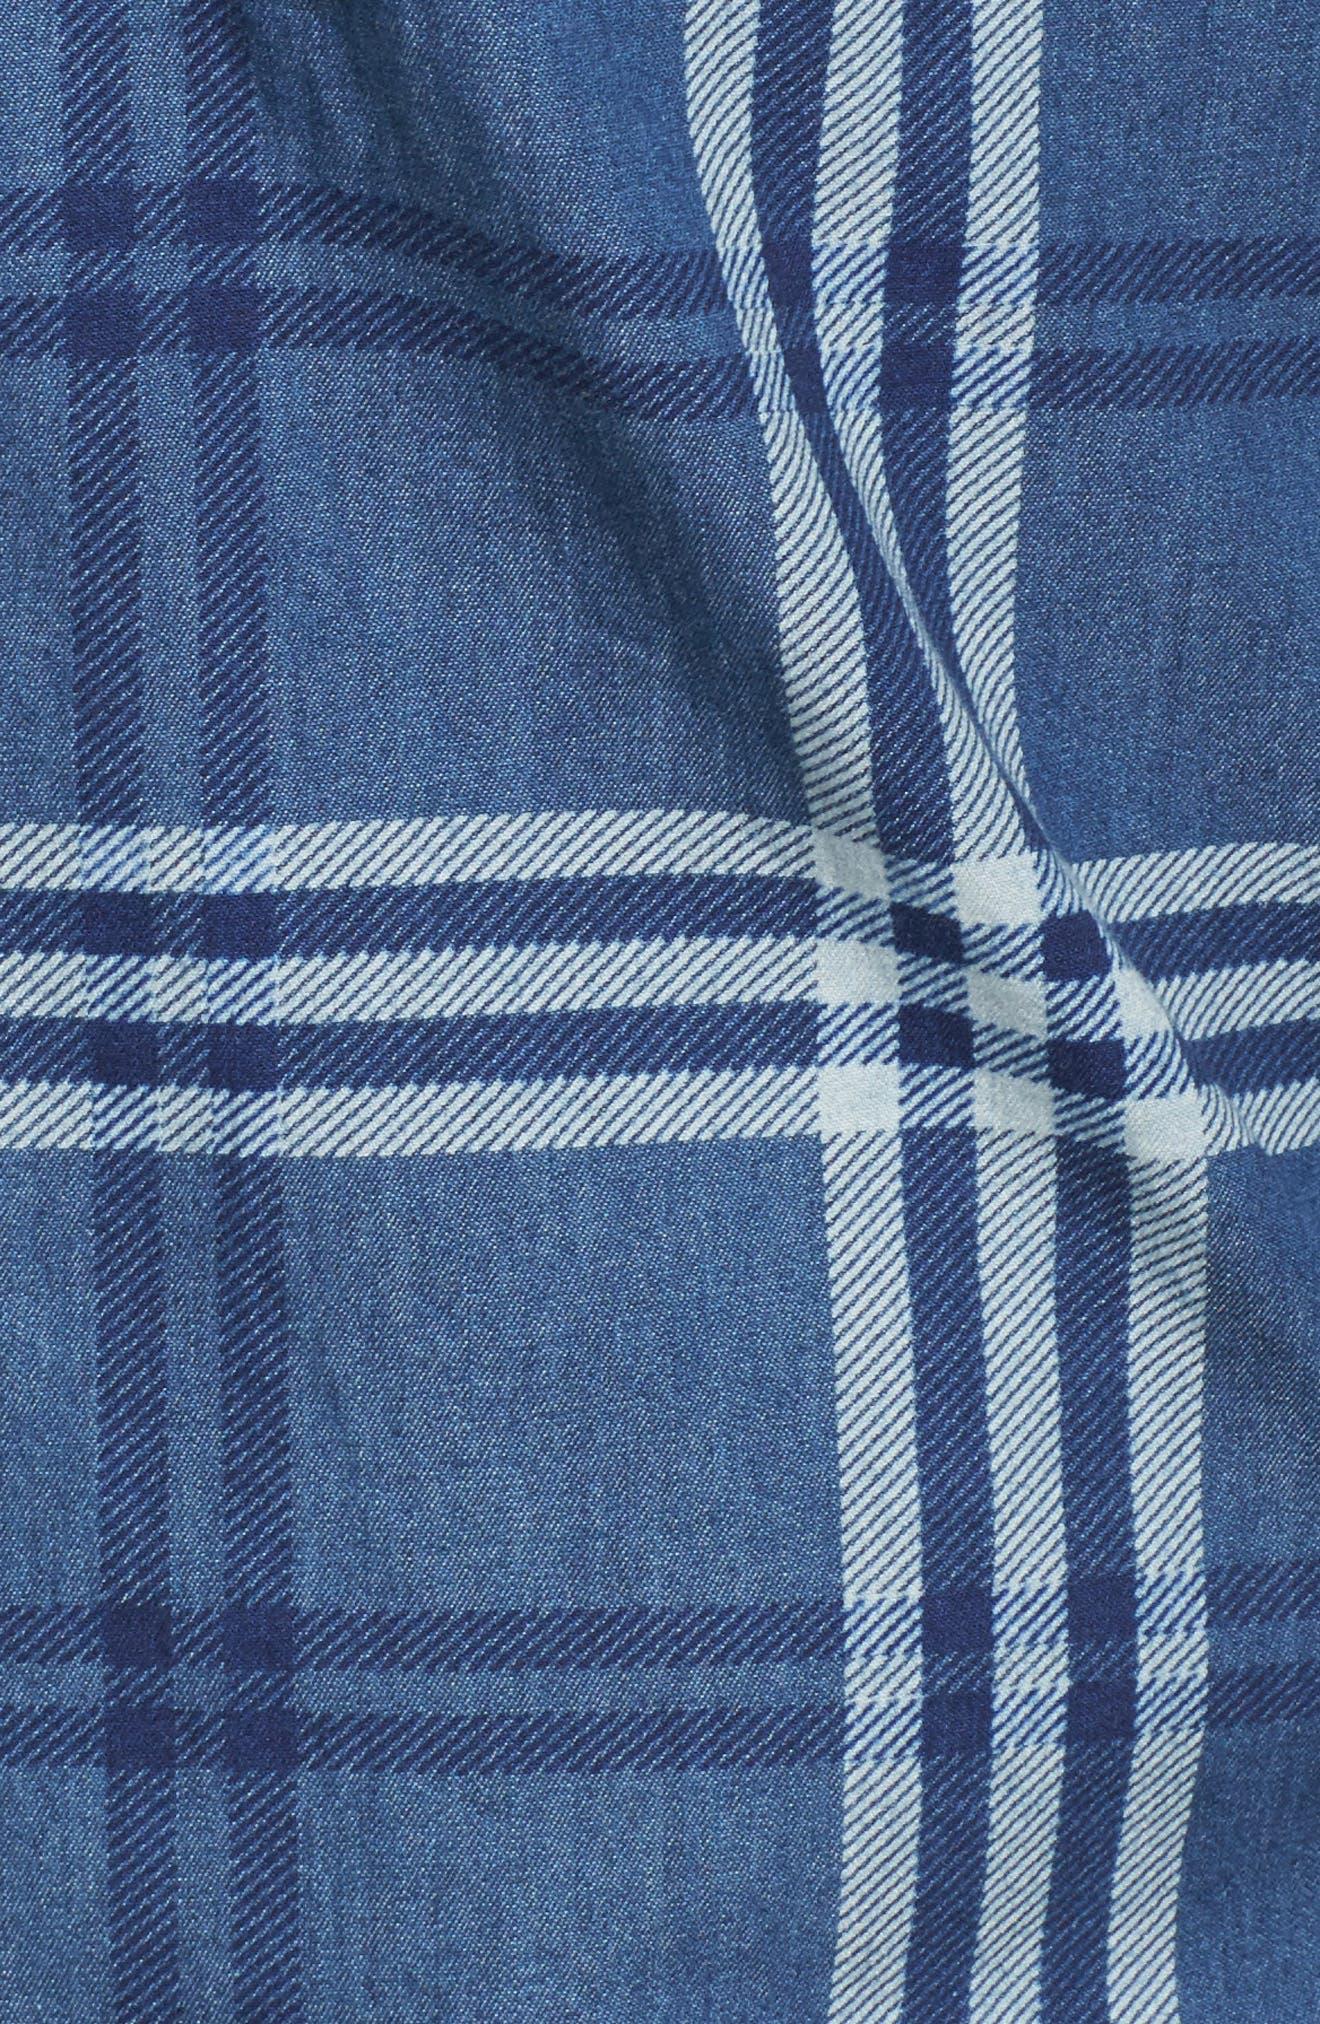 Breckenridge Plaid Sport Shirt,                             Alternate thumbnail 5, color,                             400